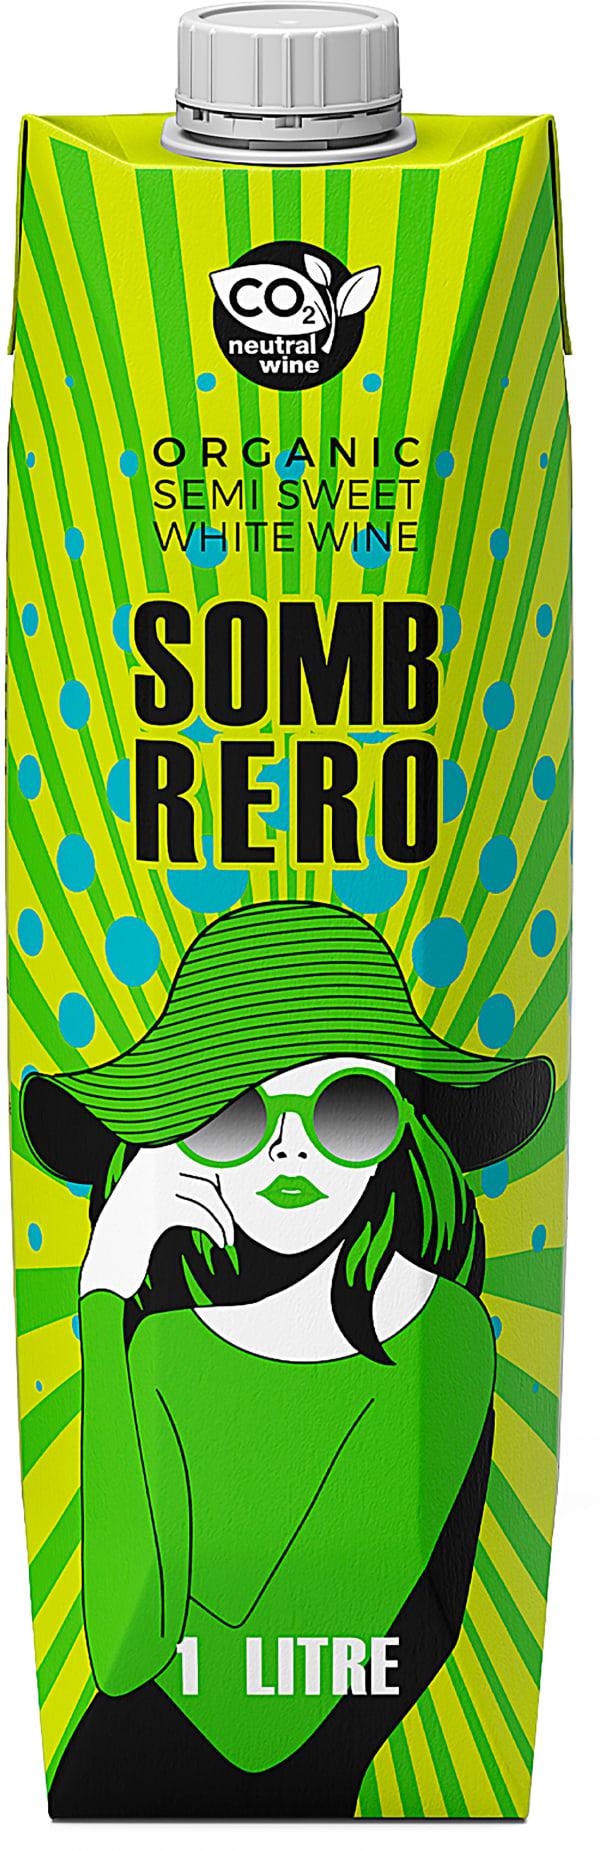 Sombrero Semi Sweet Organic 2020 kartongförpackning